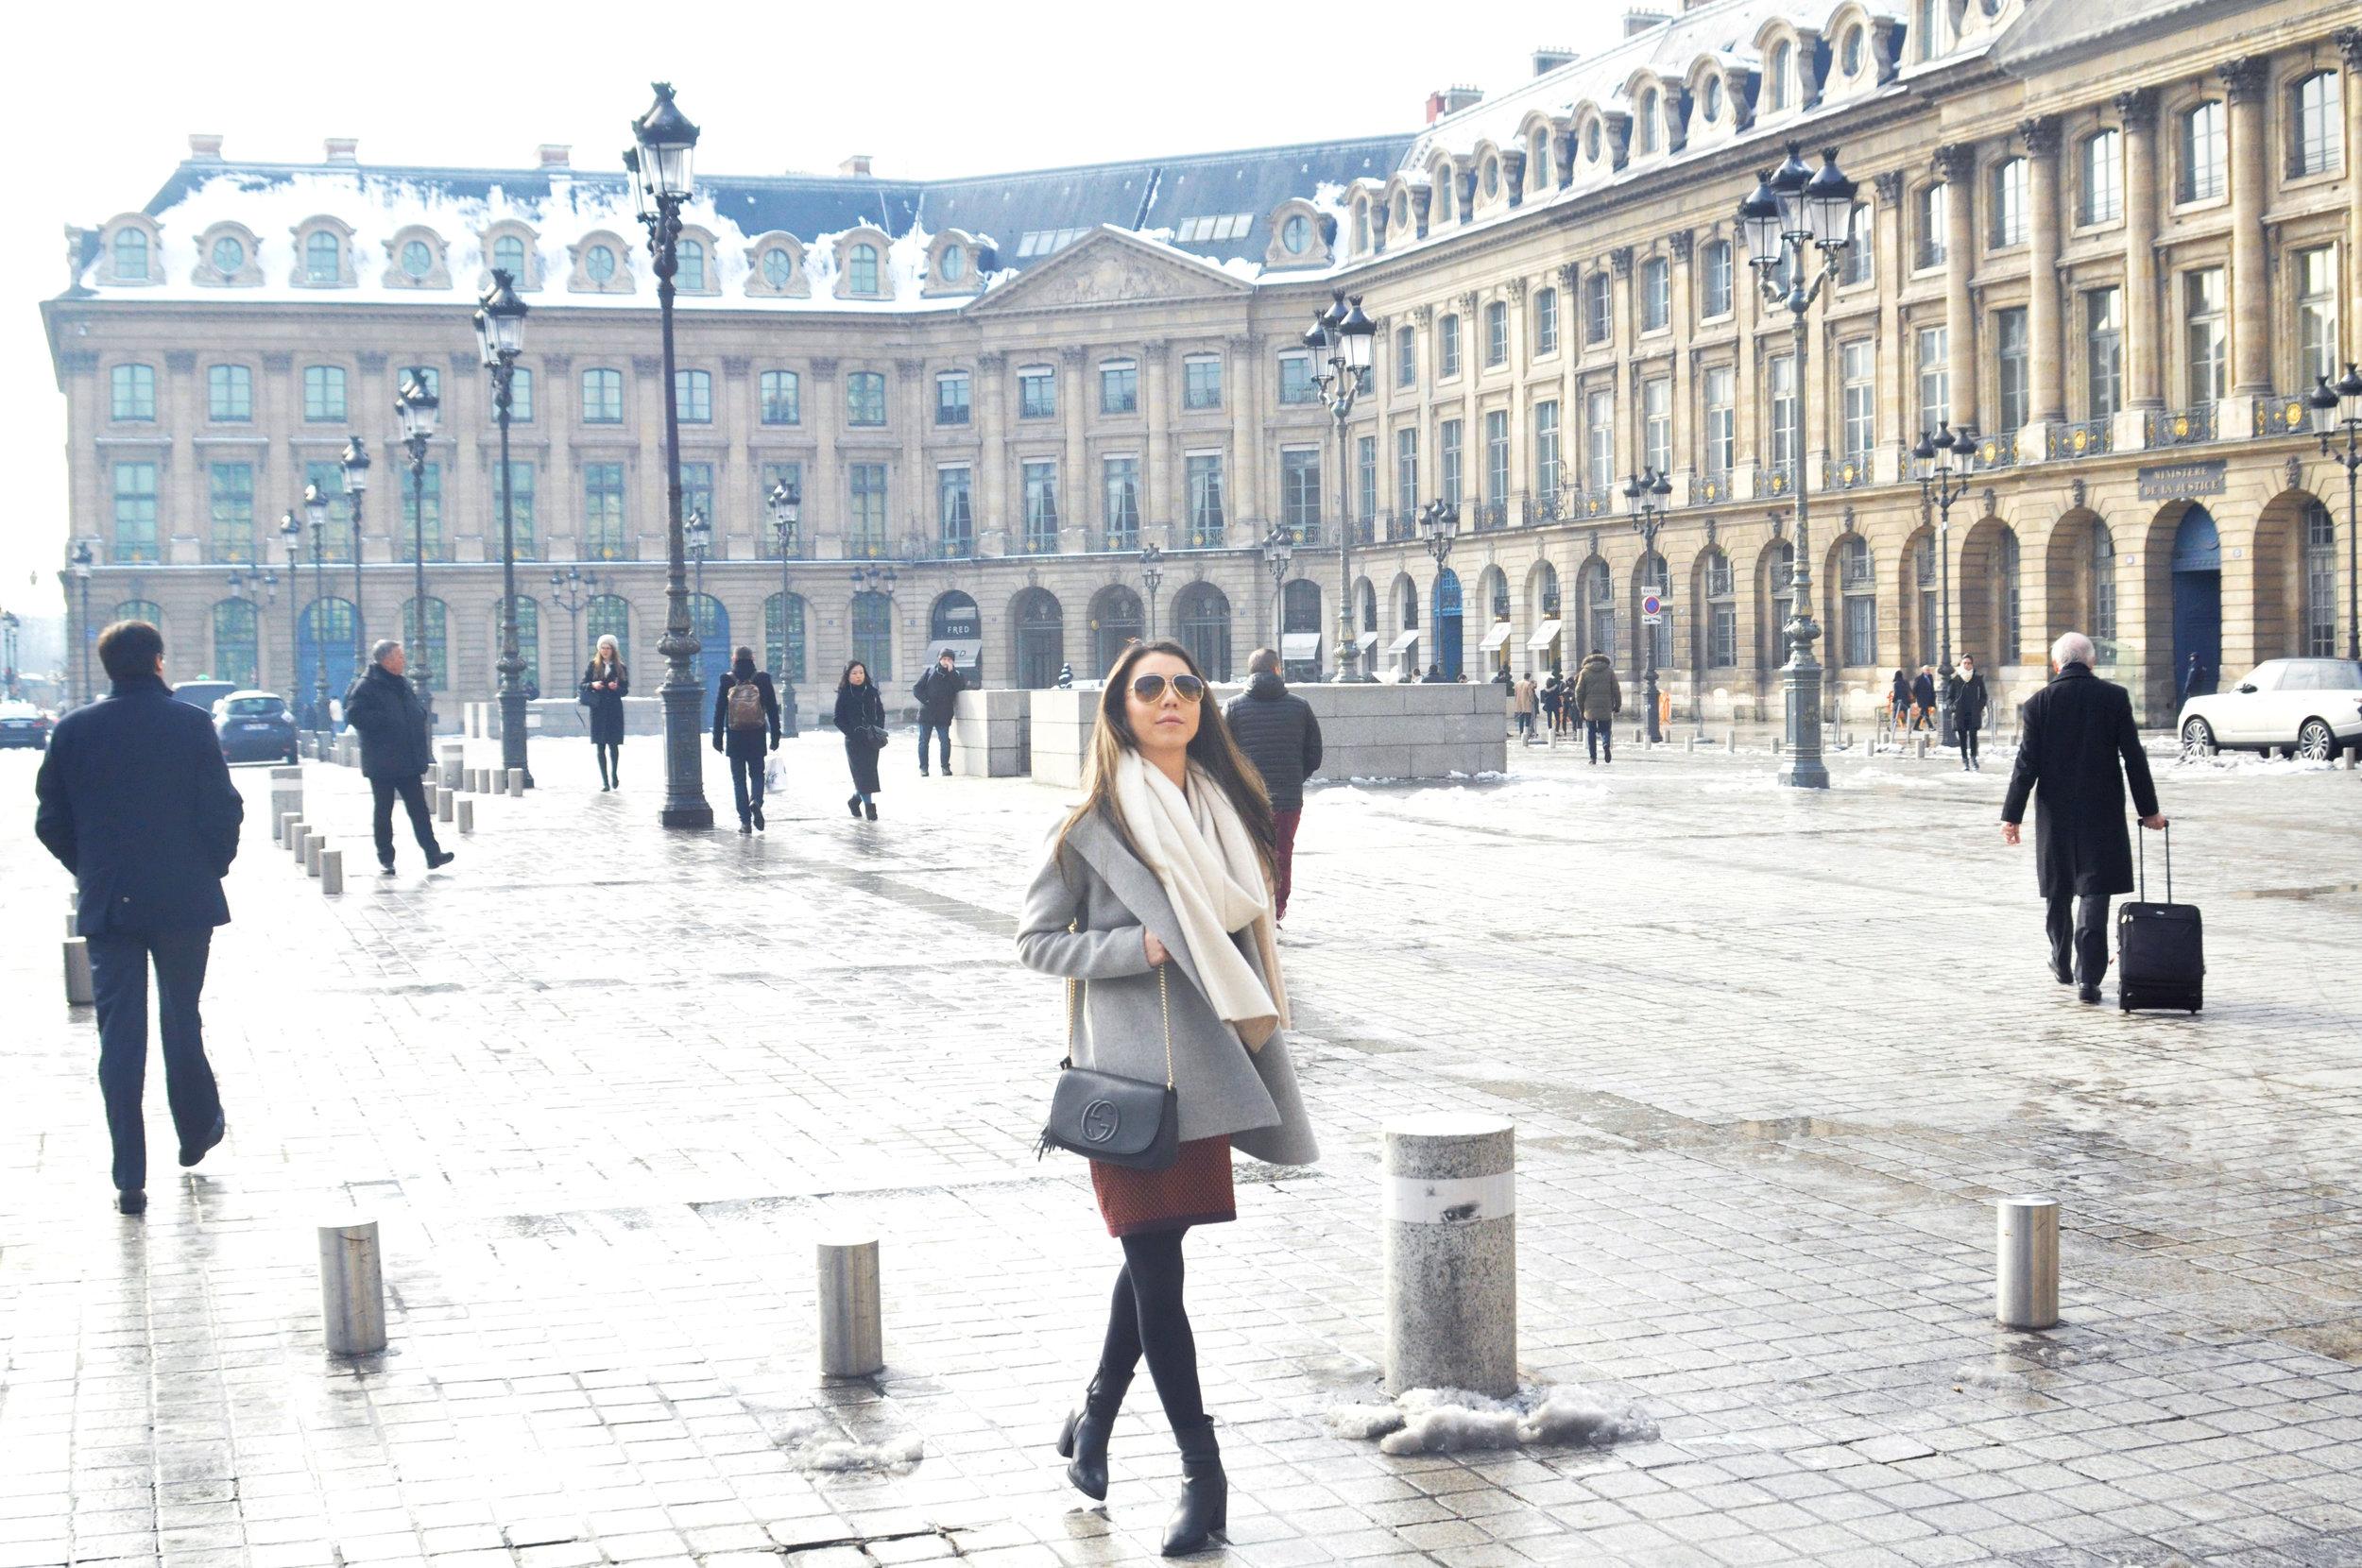 Place Vendome in Paris